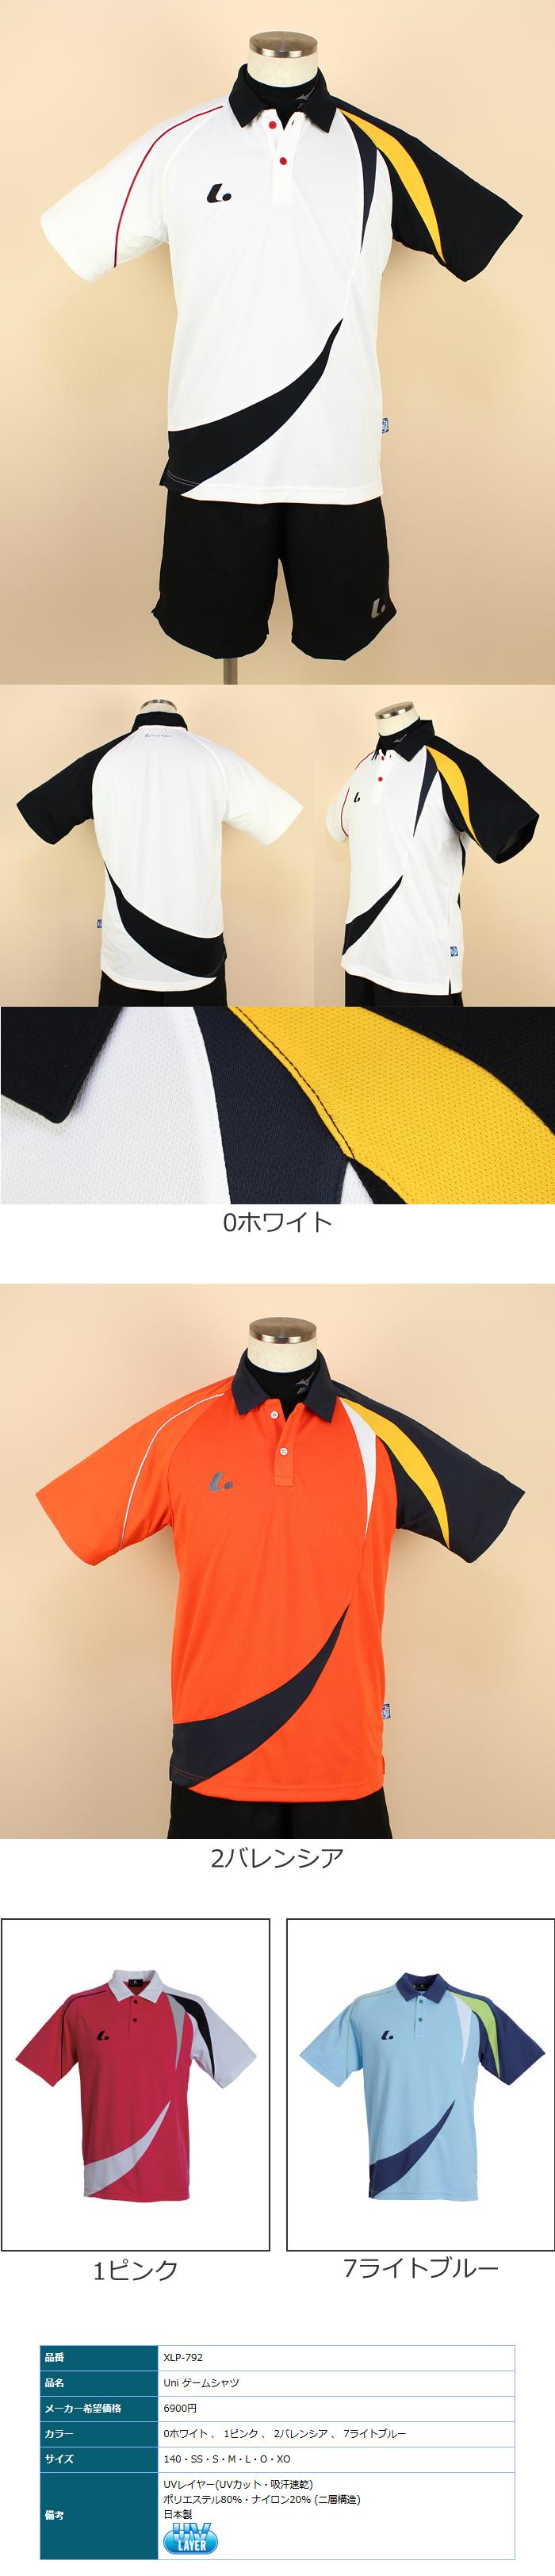 http://youspo.on.arena.ne.jp/newproduct/LUCENT/XLP-792/xlp792.jpg